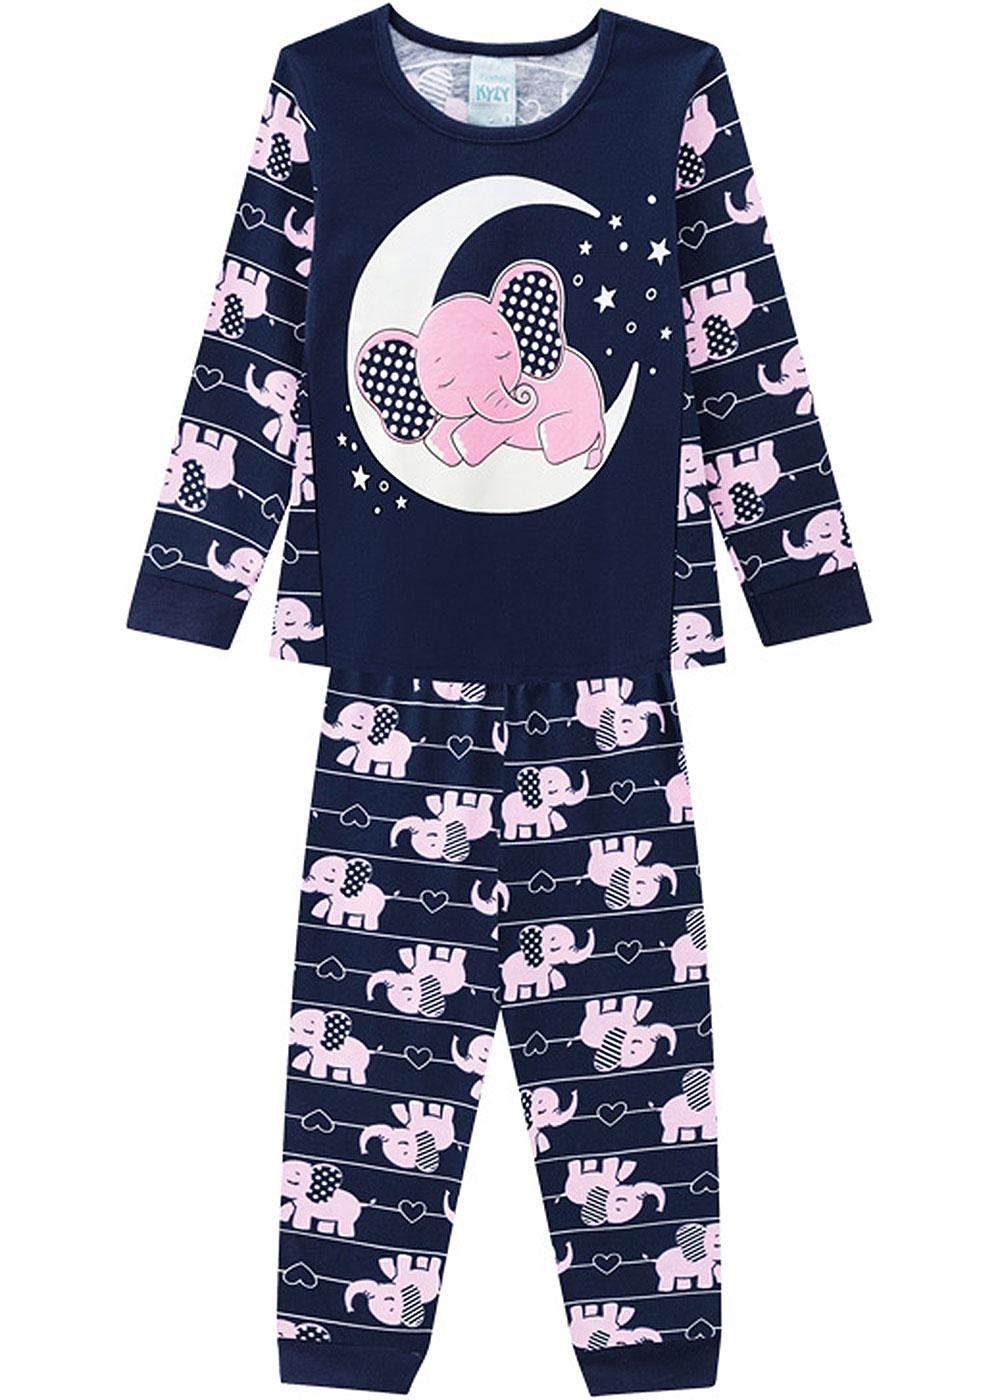 Pijama Infantil Feminino Inverno Azul Elefante Kyly